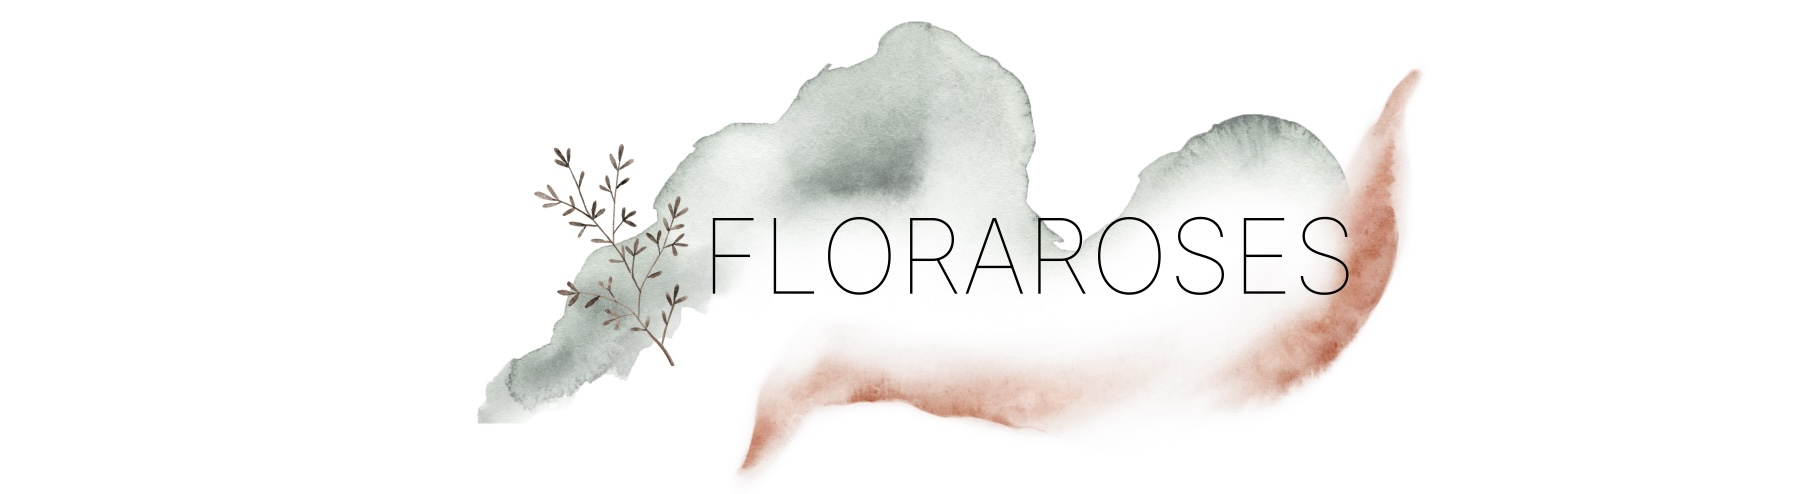 floraroses